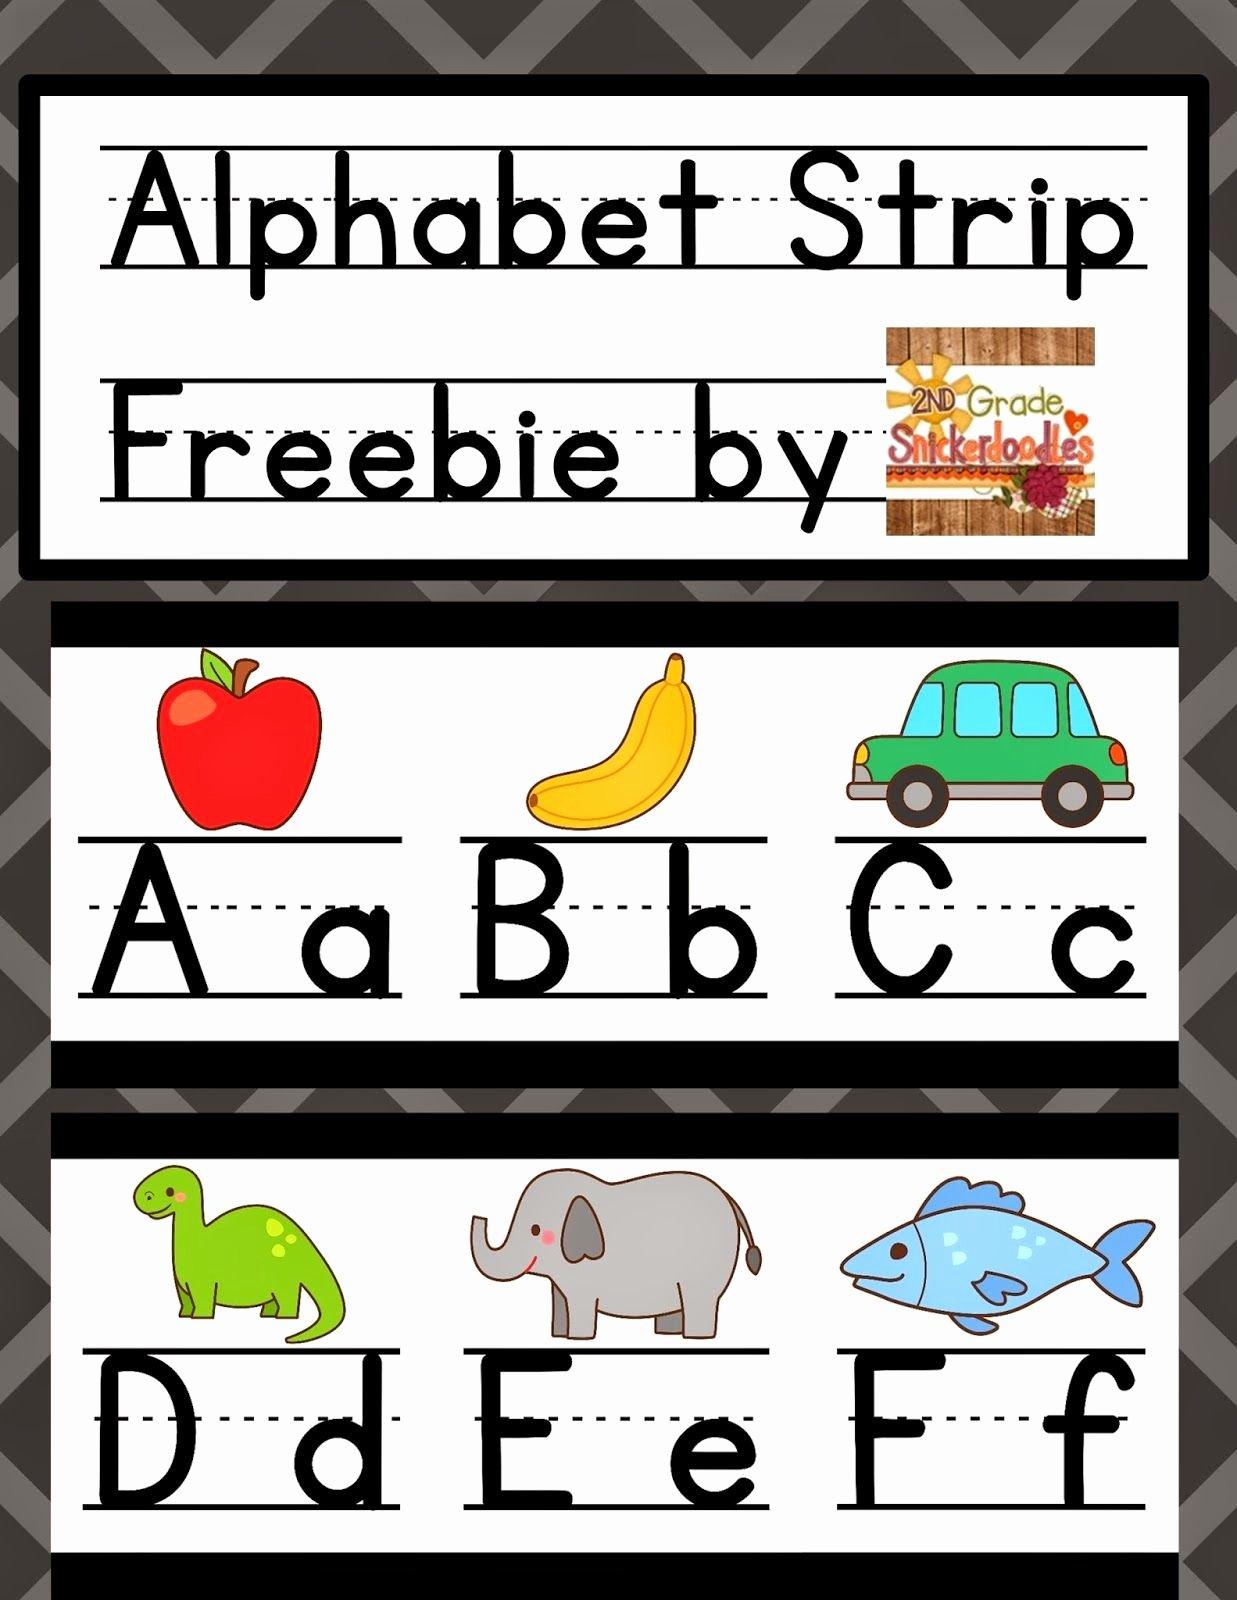 Alphabet Poster for Classroom Luxury 2nd Grade Snickerdoodles Alphabet Strip Posters Freebie